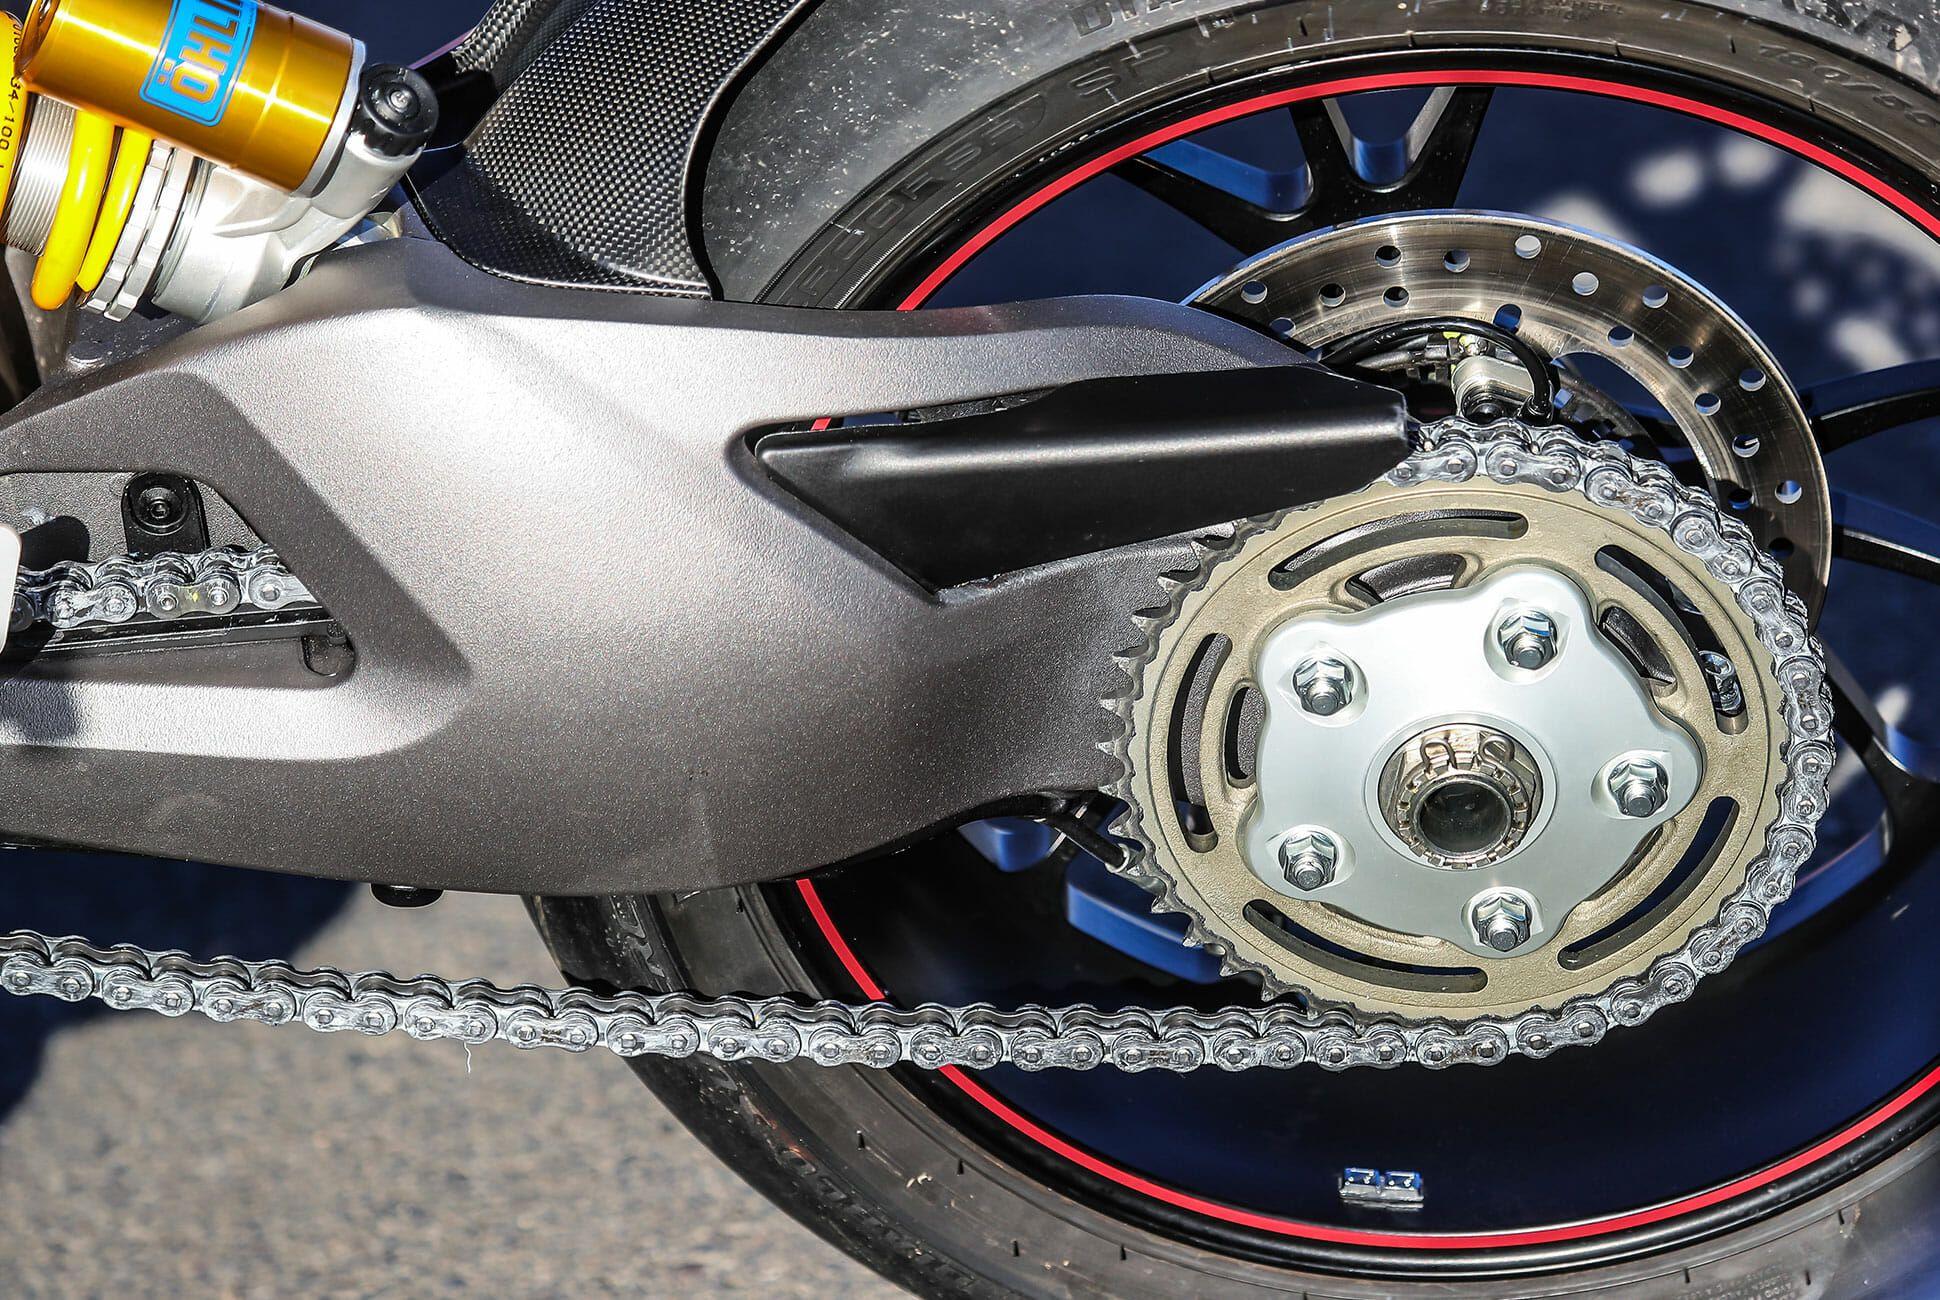 Ducati-Hypermotard-950-SP-Review-gear-patrol-slide-4